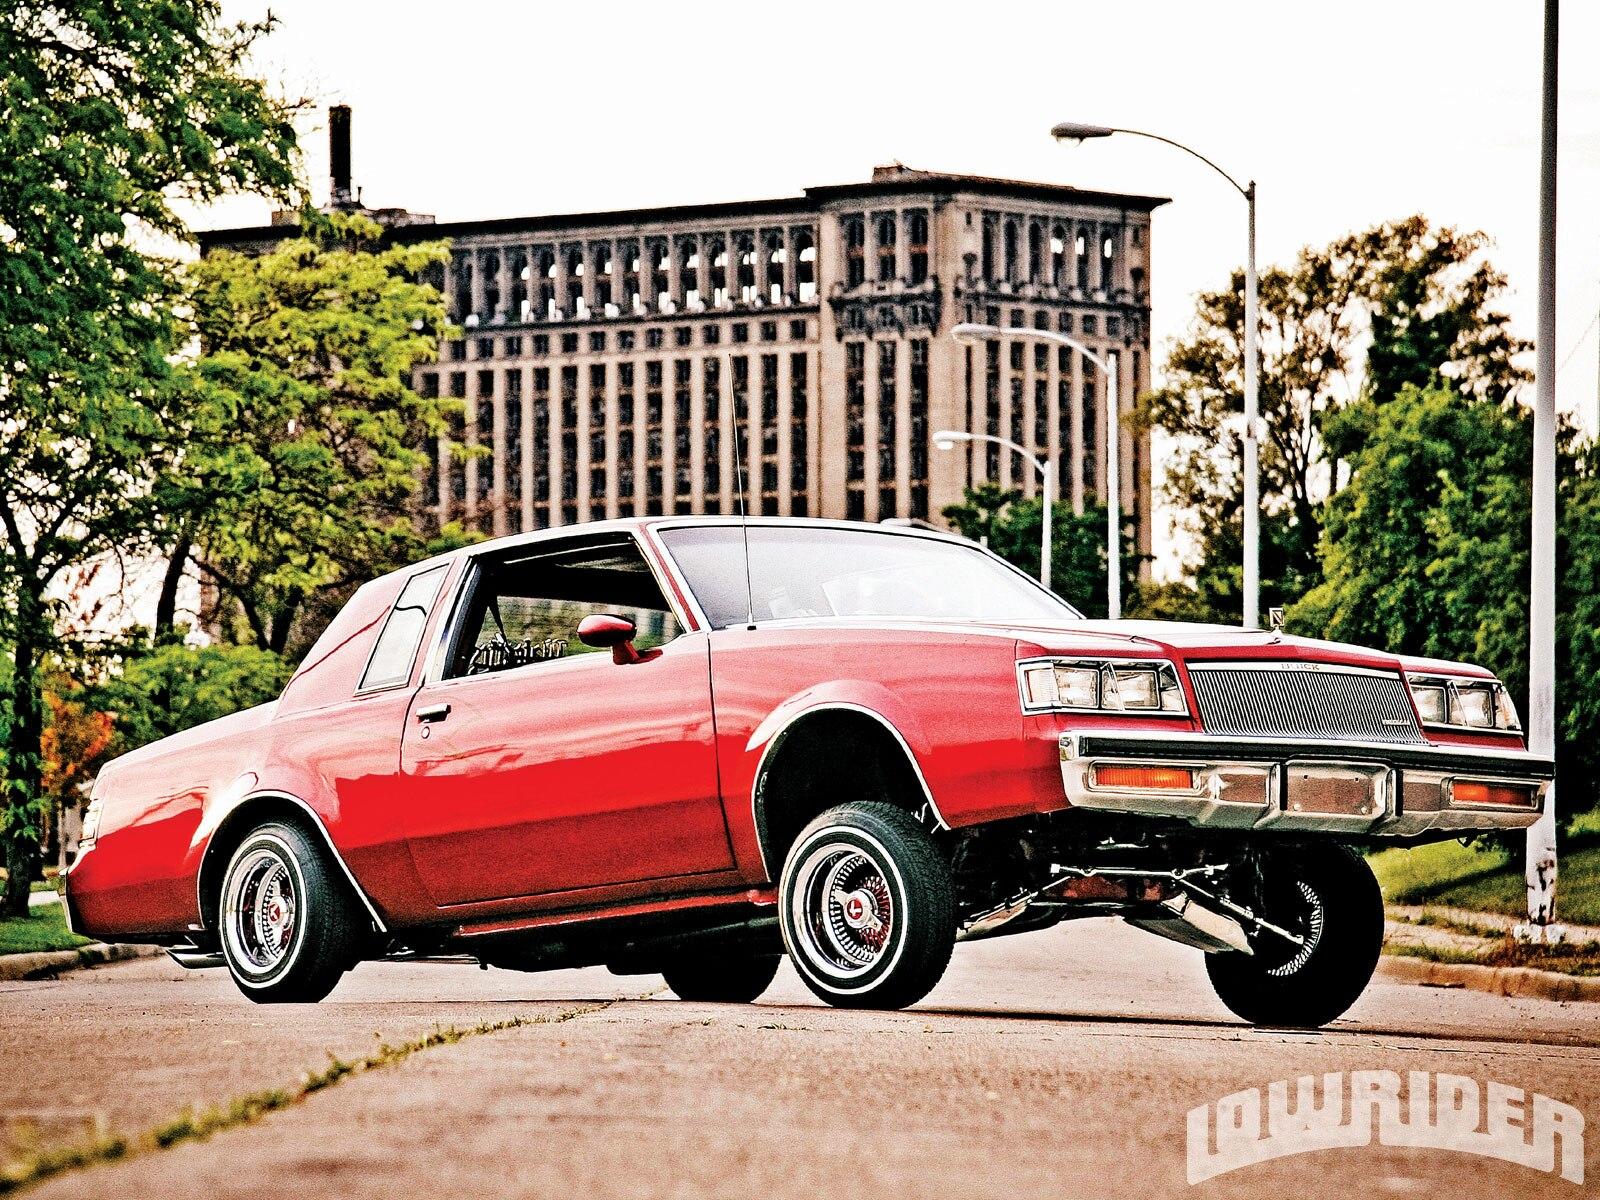 1986 Buick Regal - Chevy 362 Engine - Lowrider Magazine